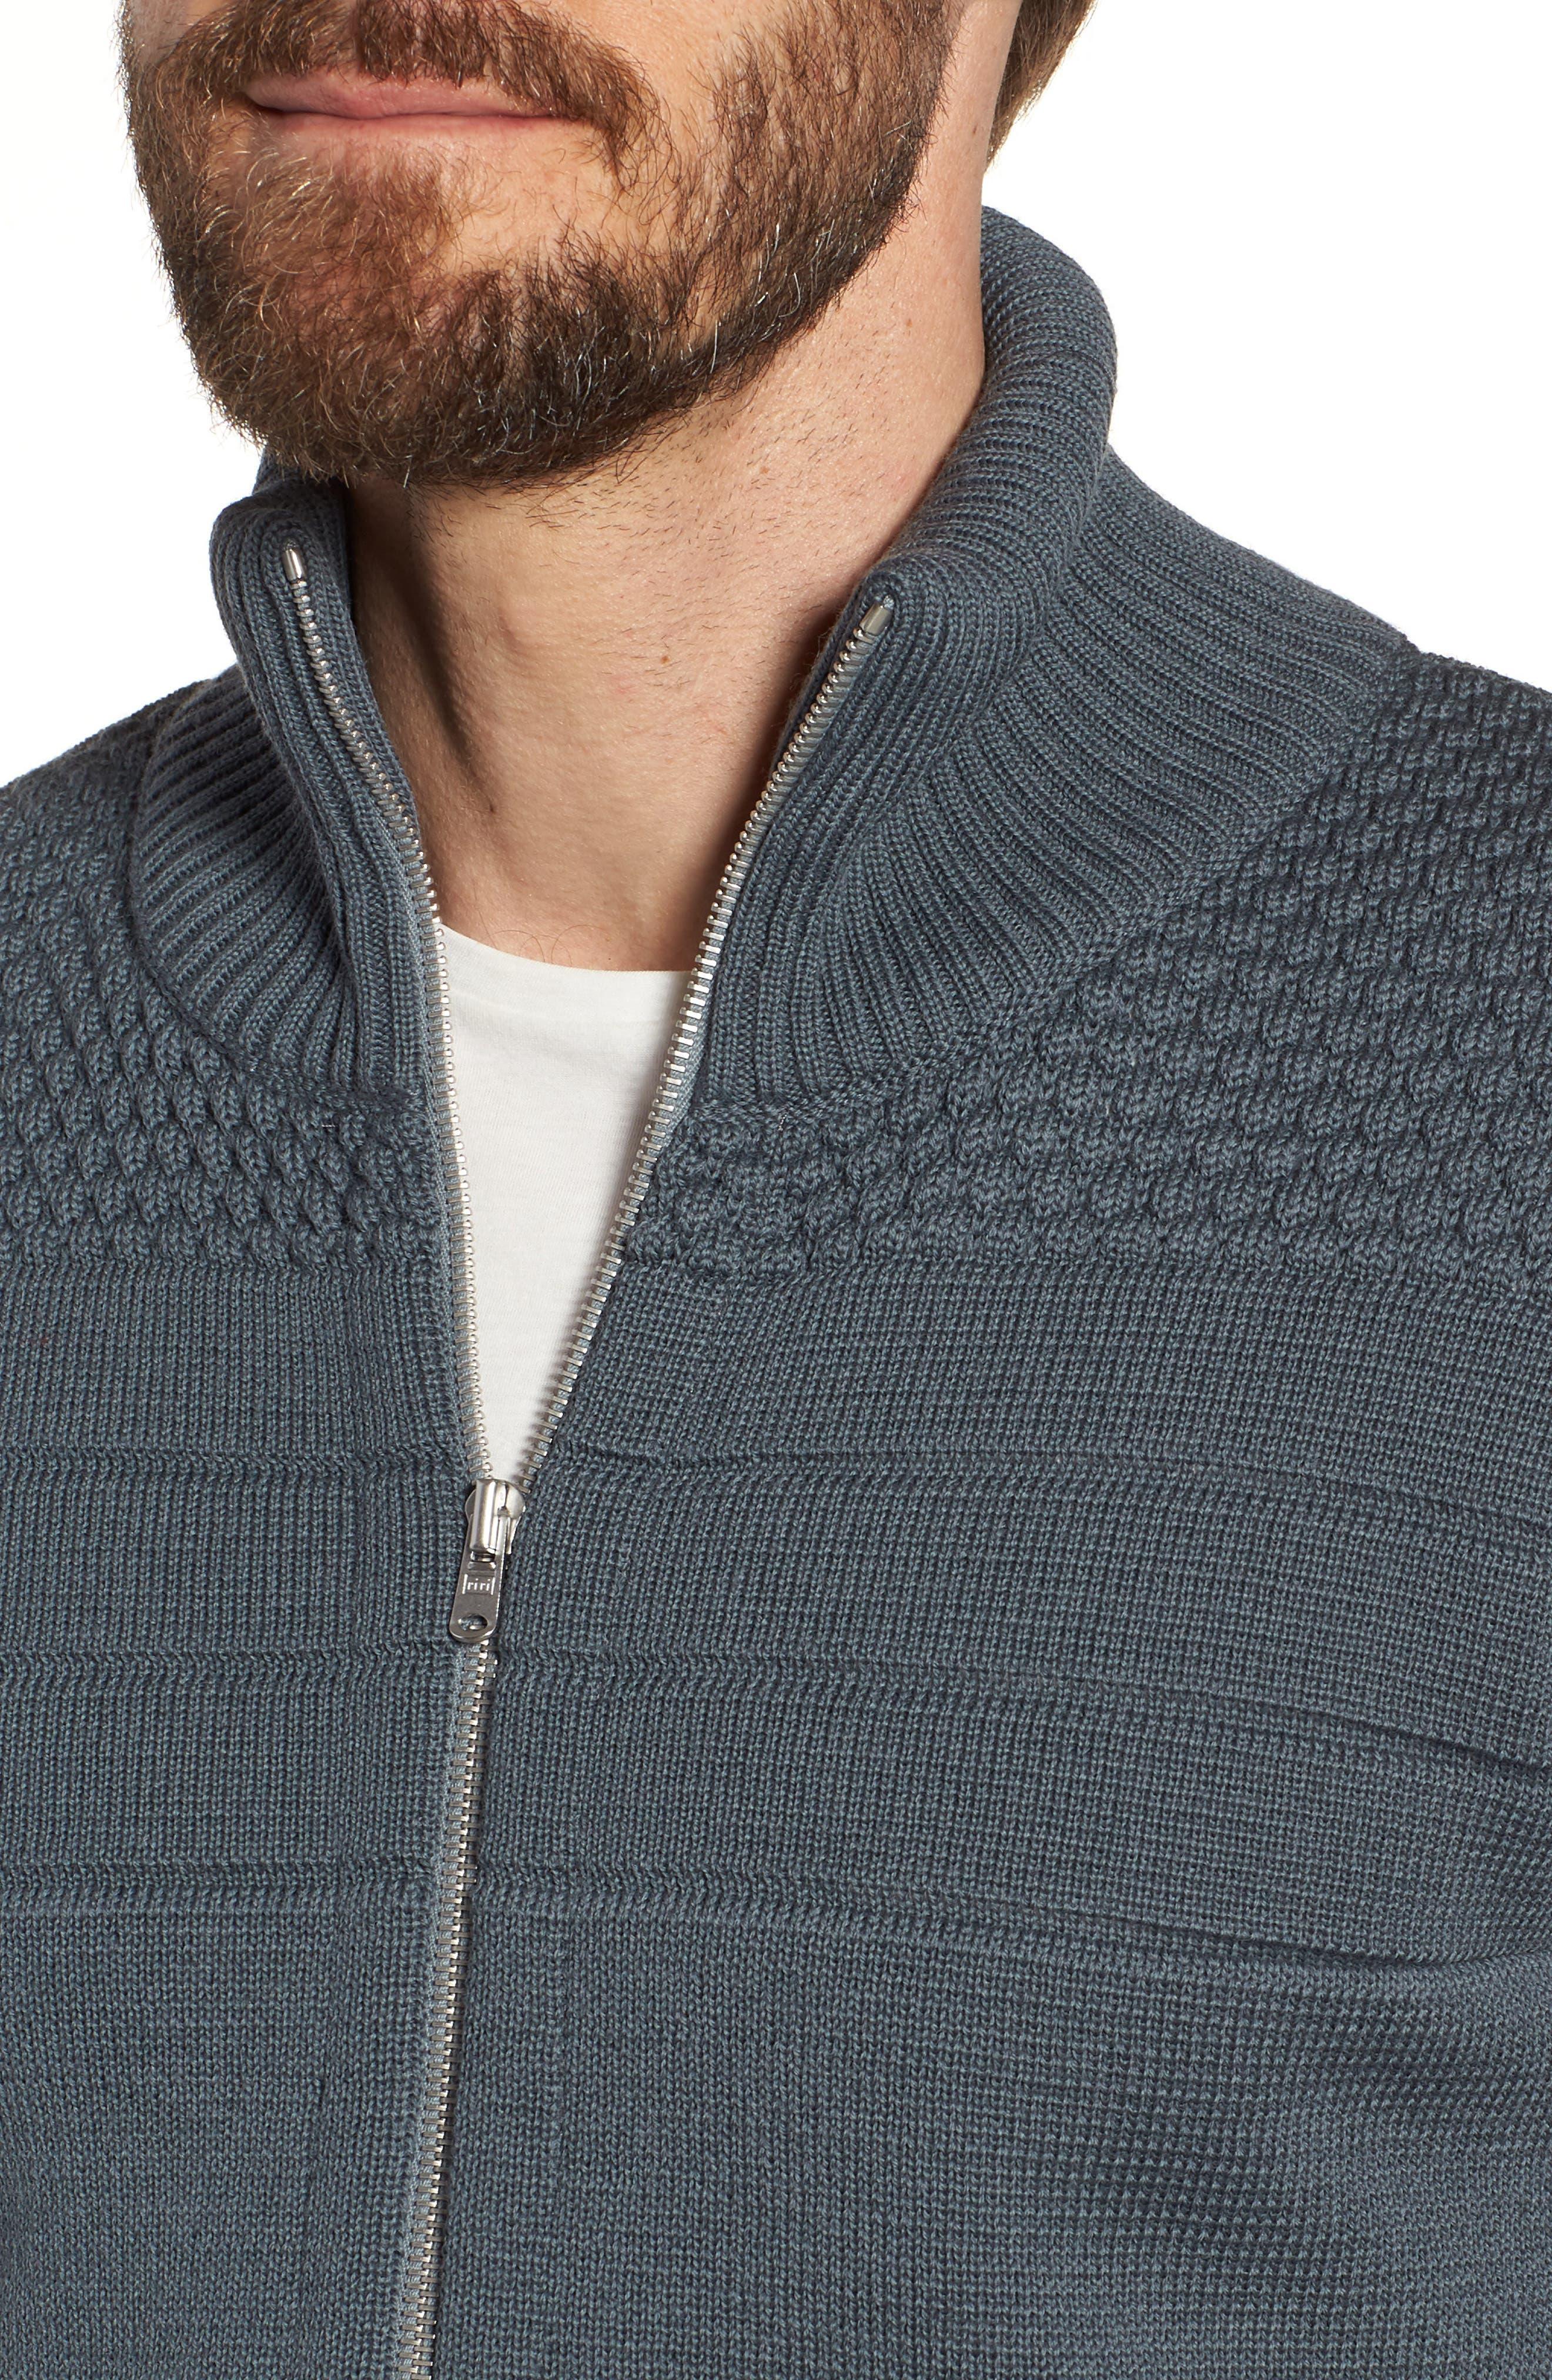 Torso Jacket,                             Alternate thumbnail 4, color,                             Uniform Grey